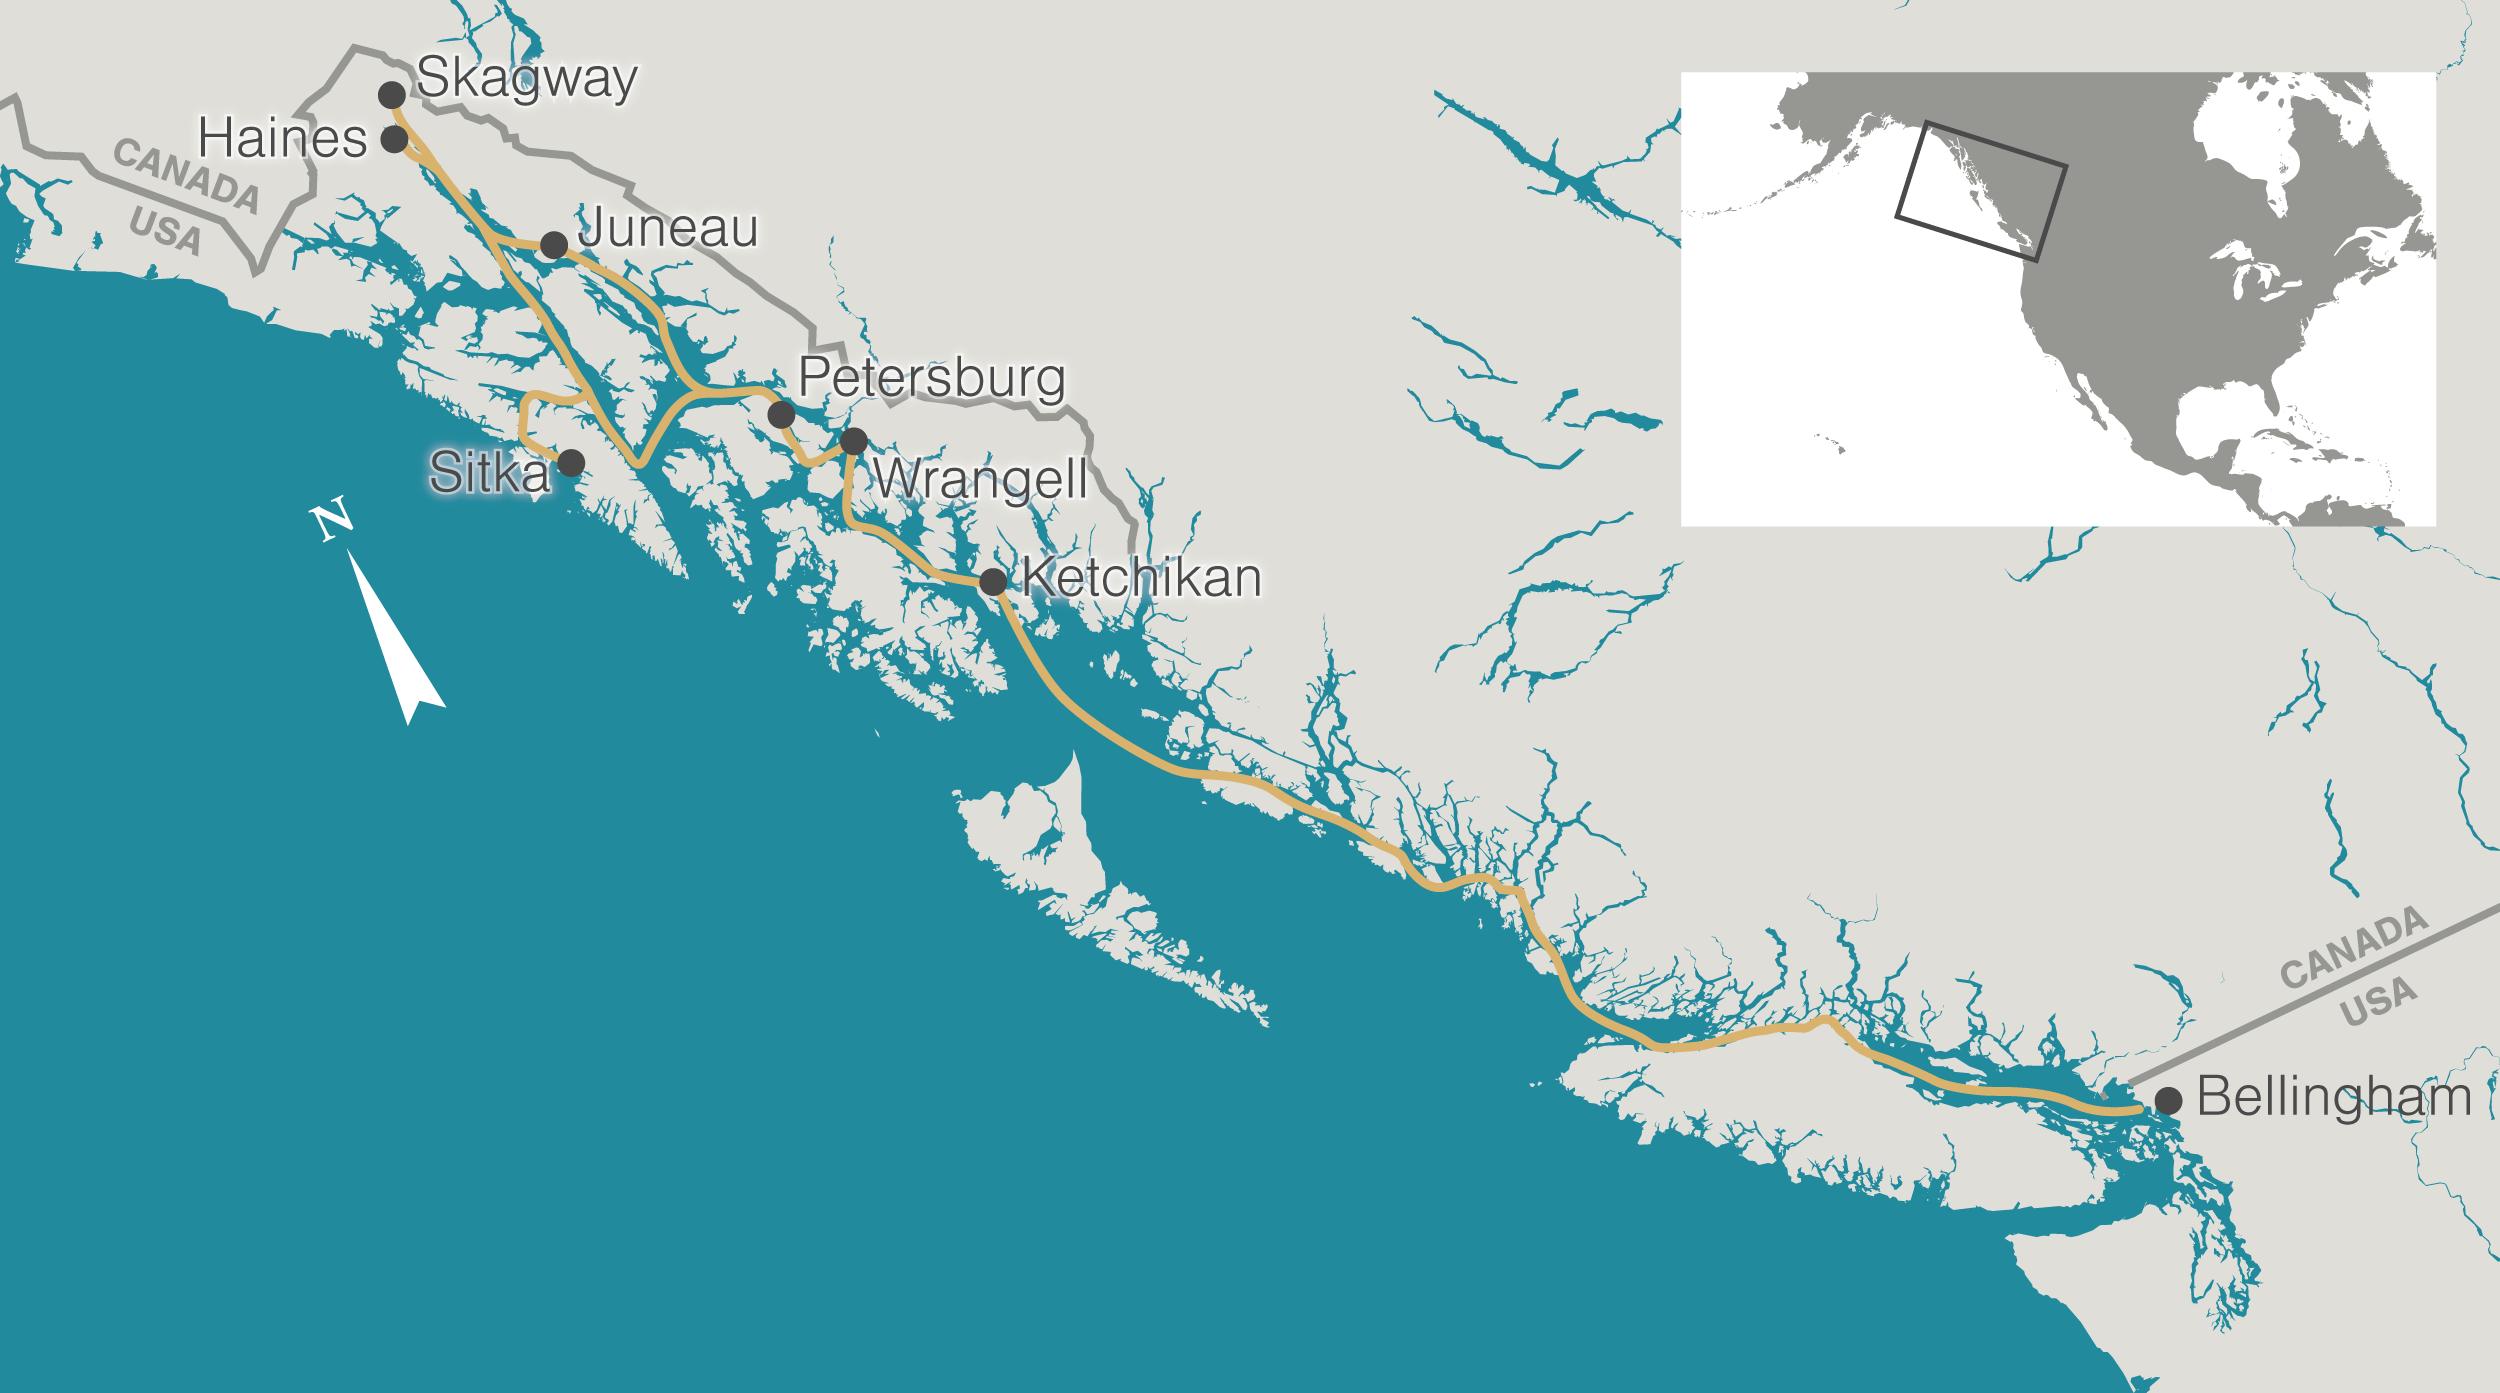 An Alaskan Voyage to Track Ocean Acidification | Hakai Magazine on ketchikan walking map, wasilla map, ketchikan alaska map, glacier bay alaska map, white pass alaska map, dawson city alaska map, whittier alaska map, palmer alaska map, tracy arm alaska map, sitka alaska map, dutch harbor alaska map, seward alaska map, juno alaska map, nulato alaska map, victoria bc map, hubbard glacier map, juneau map, unalakleet alaska map, kenai alaska map, north pole map,